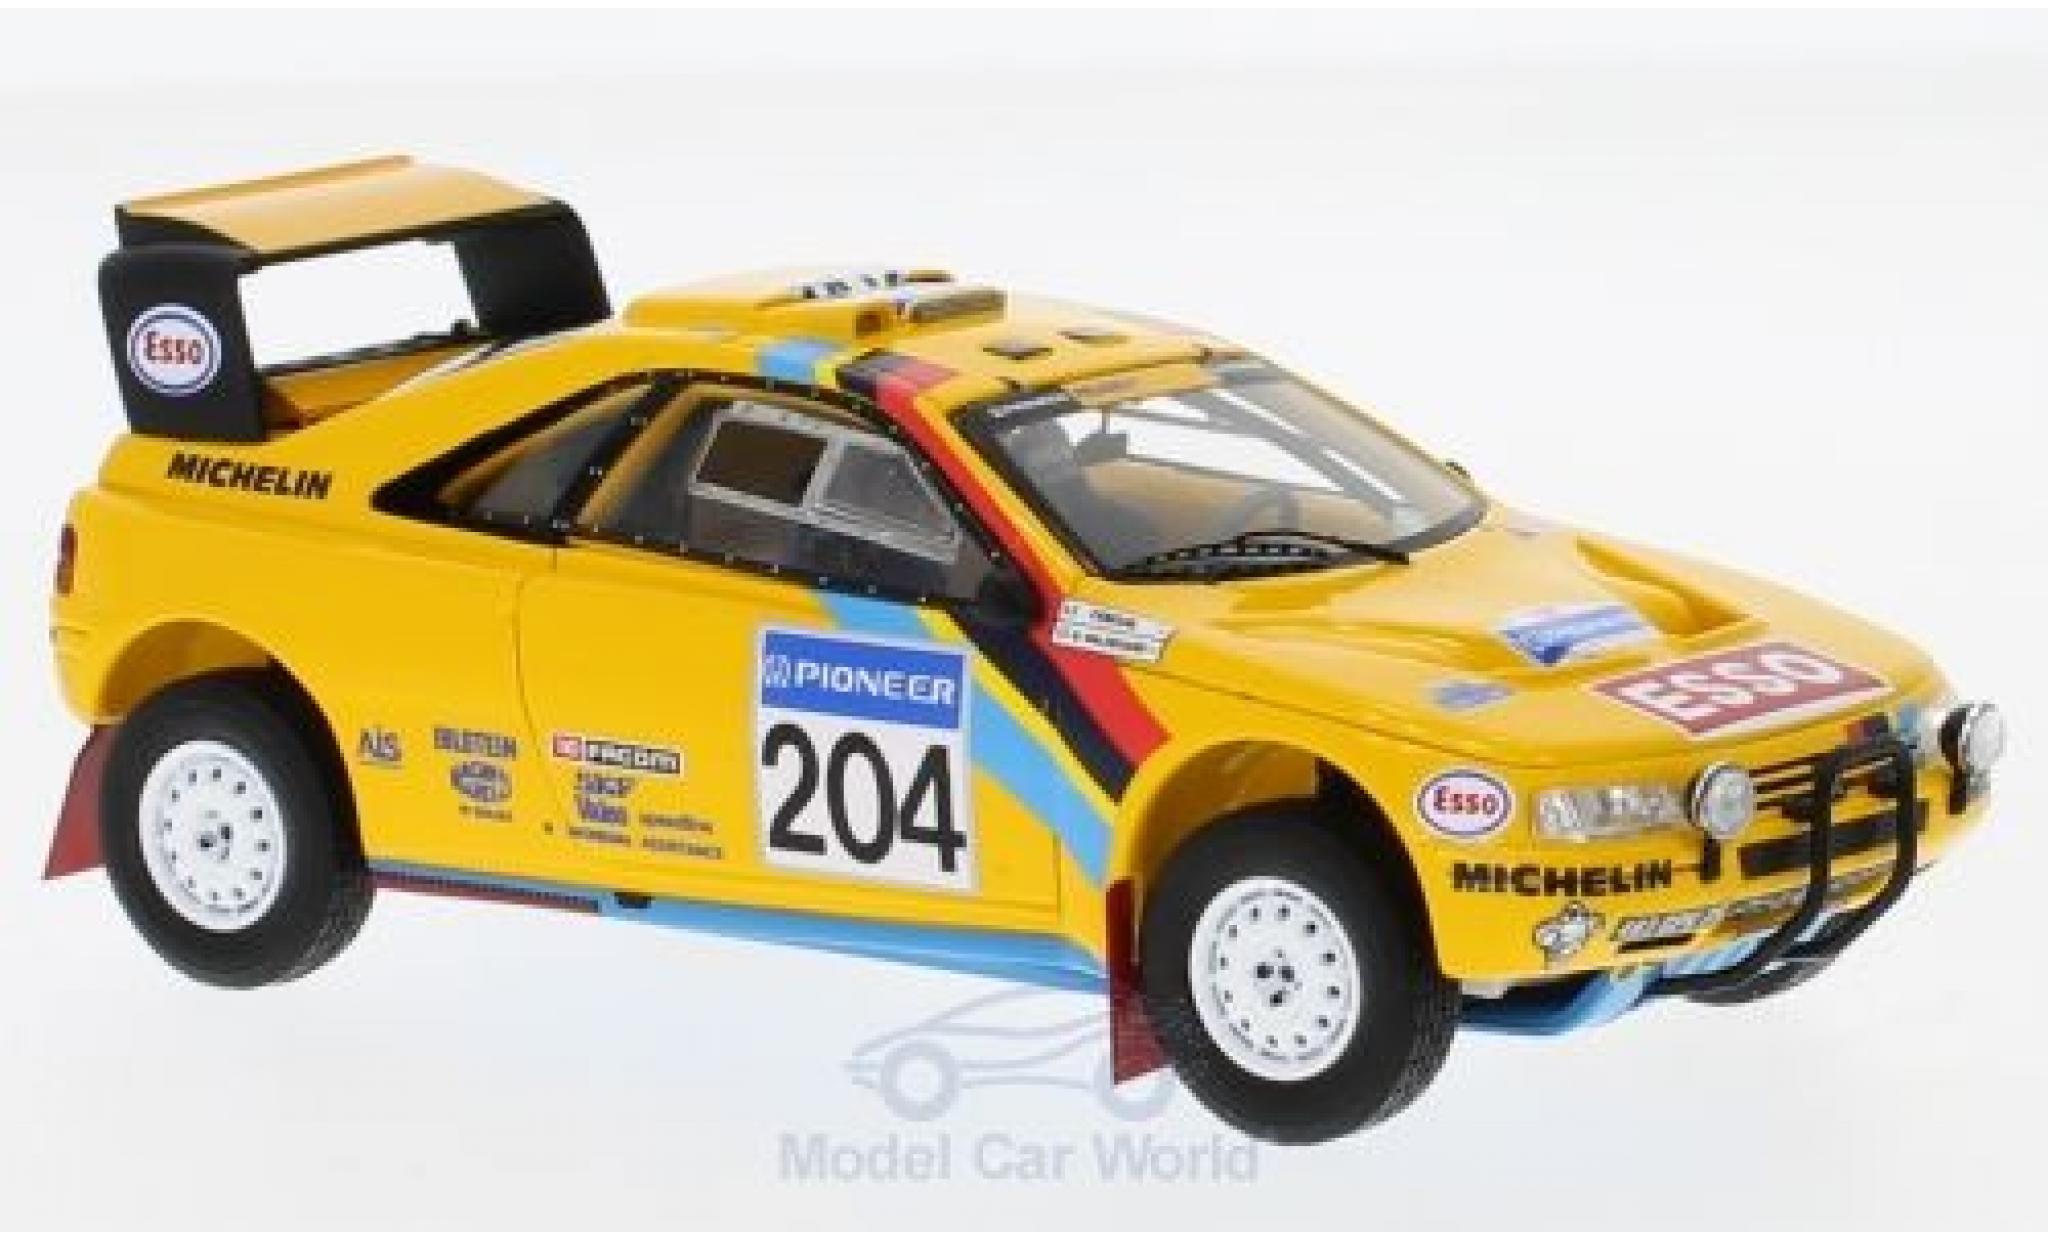 Peugeot 405 1/43 Spark T16 Grand Raid No.204 Camel Rallye Paris Dakar 1990 mit Decals B.Waldegard/J.-C.Fenouil